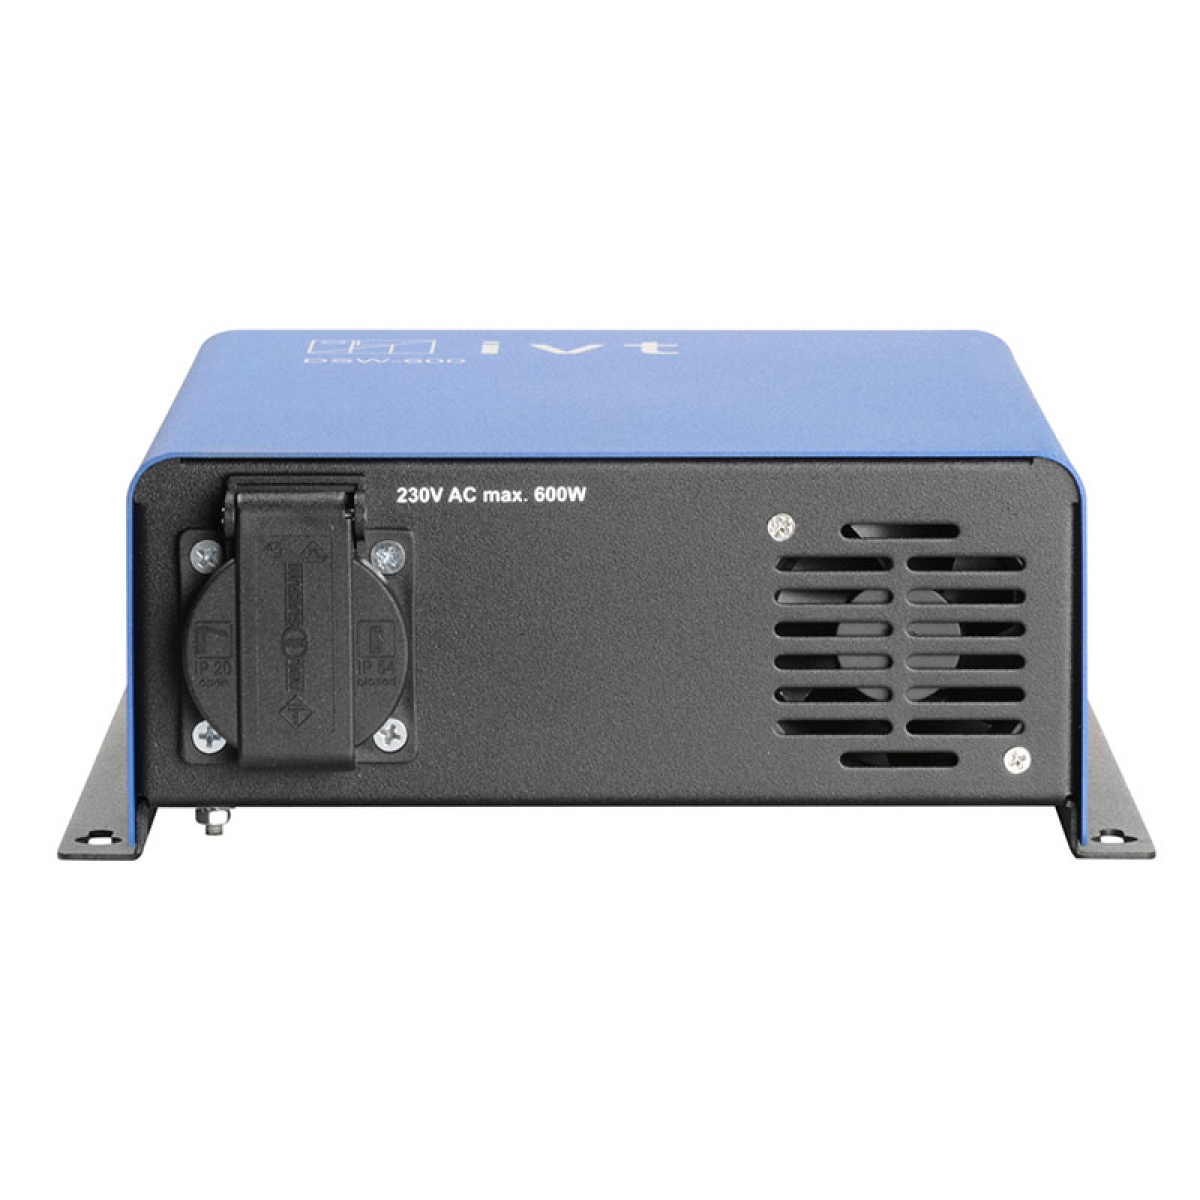 Digitaler Sinus Wechselrichter DSW-600, 12 V, 600 W - IVT-Hirschau